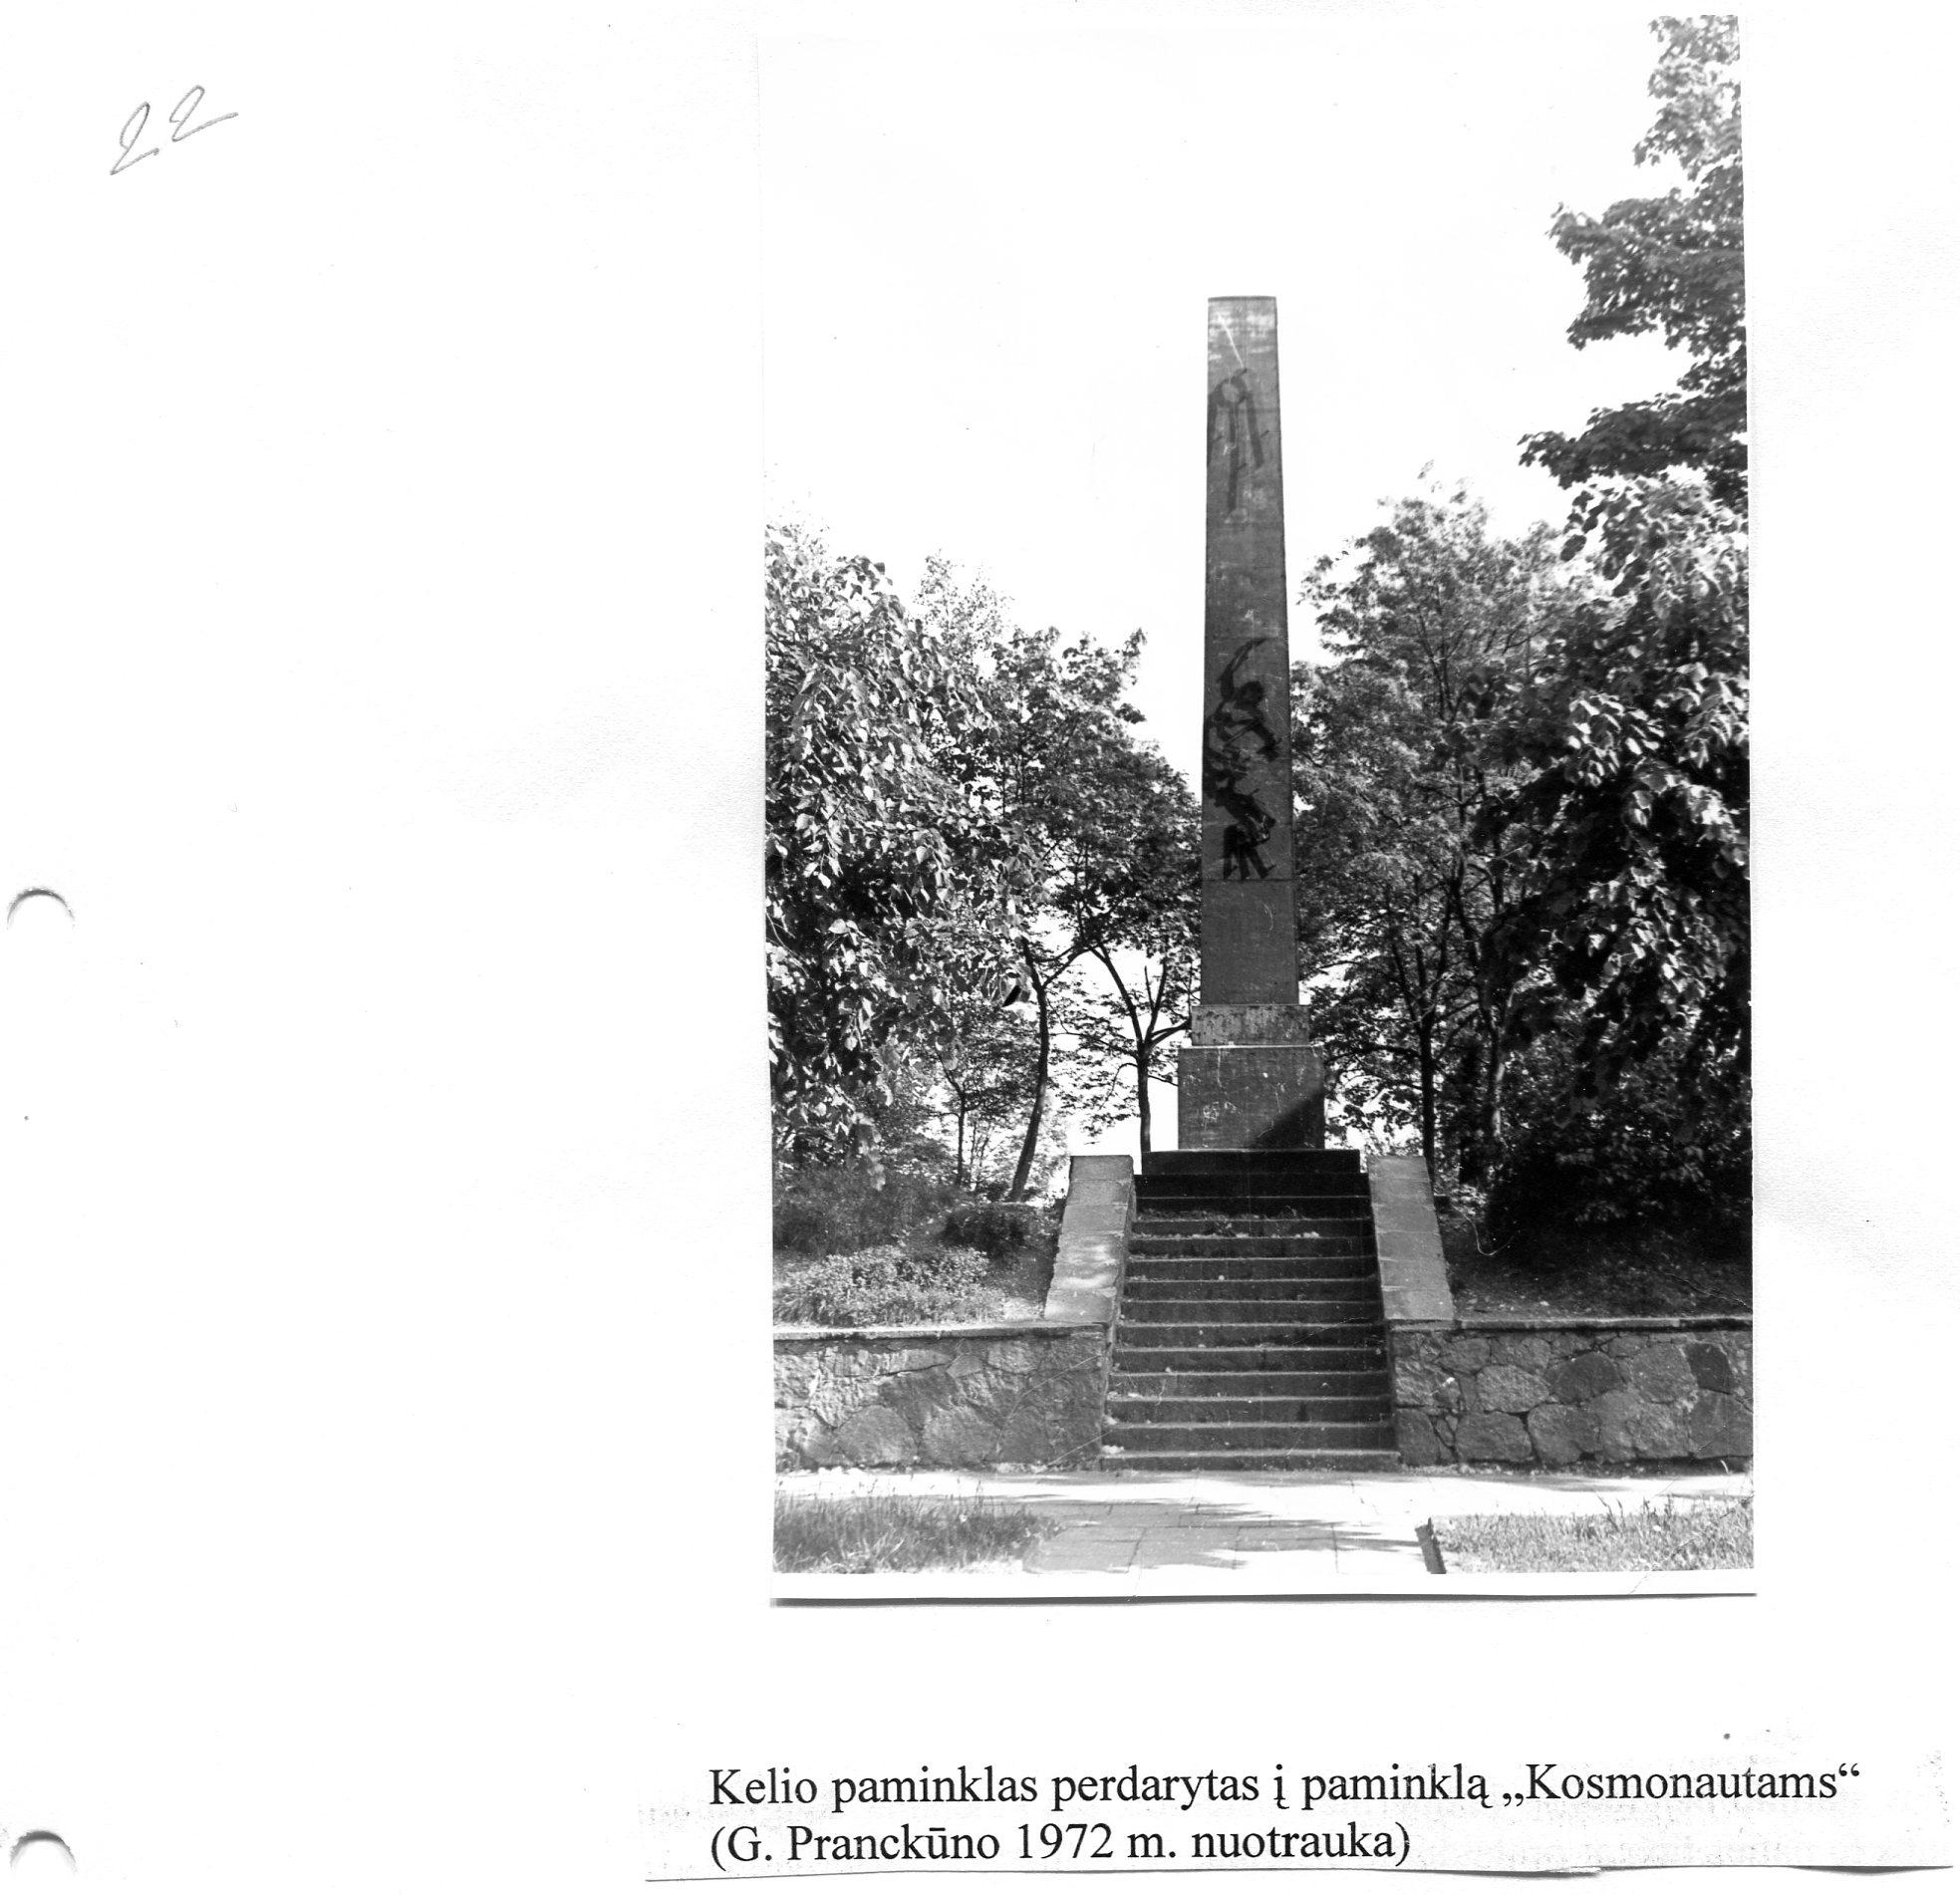 G.Pranck. Obeliskas ,,Kosmonautams. Foto 1972